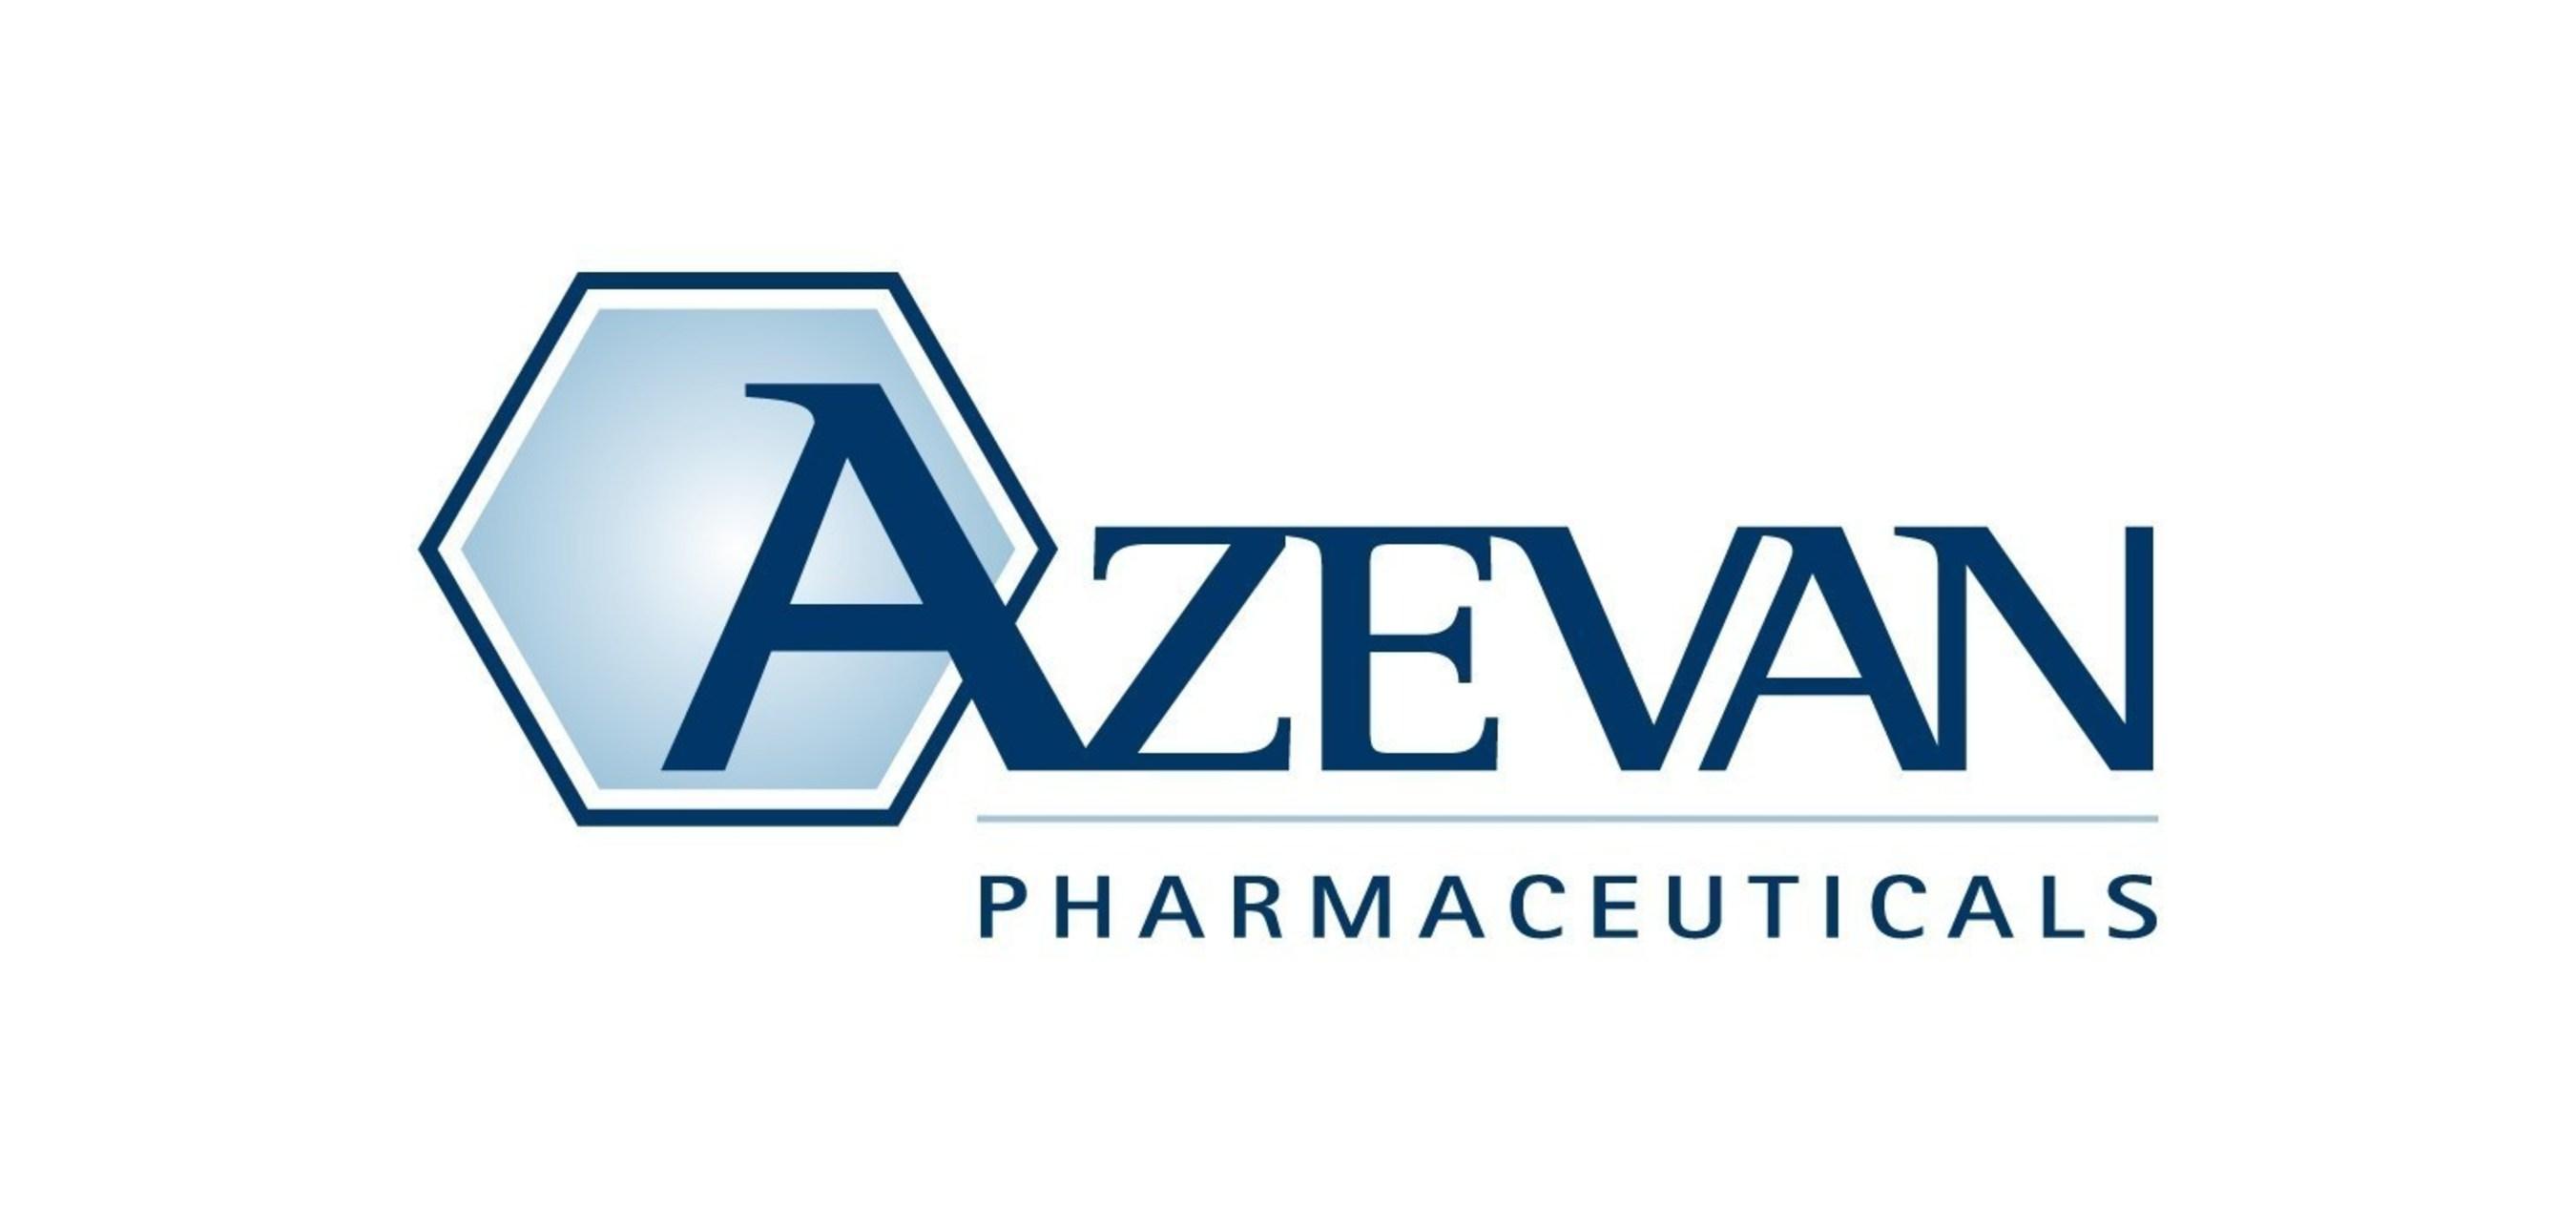 Developing Next Generation Pharmaceuticals